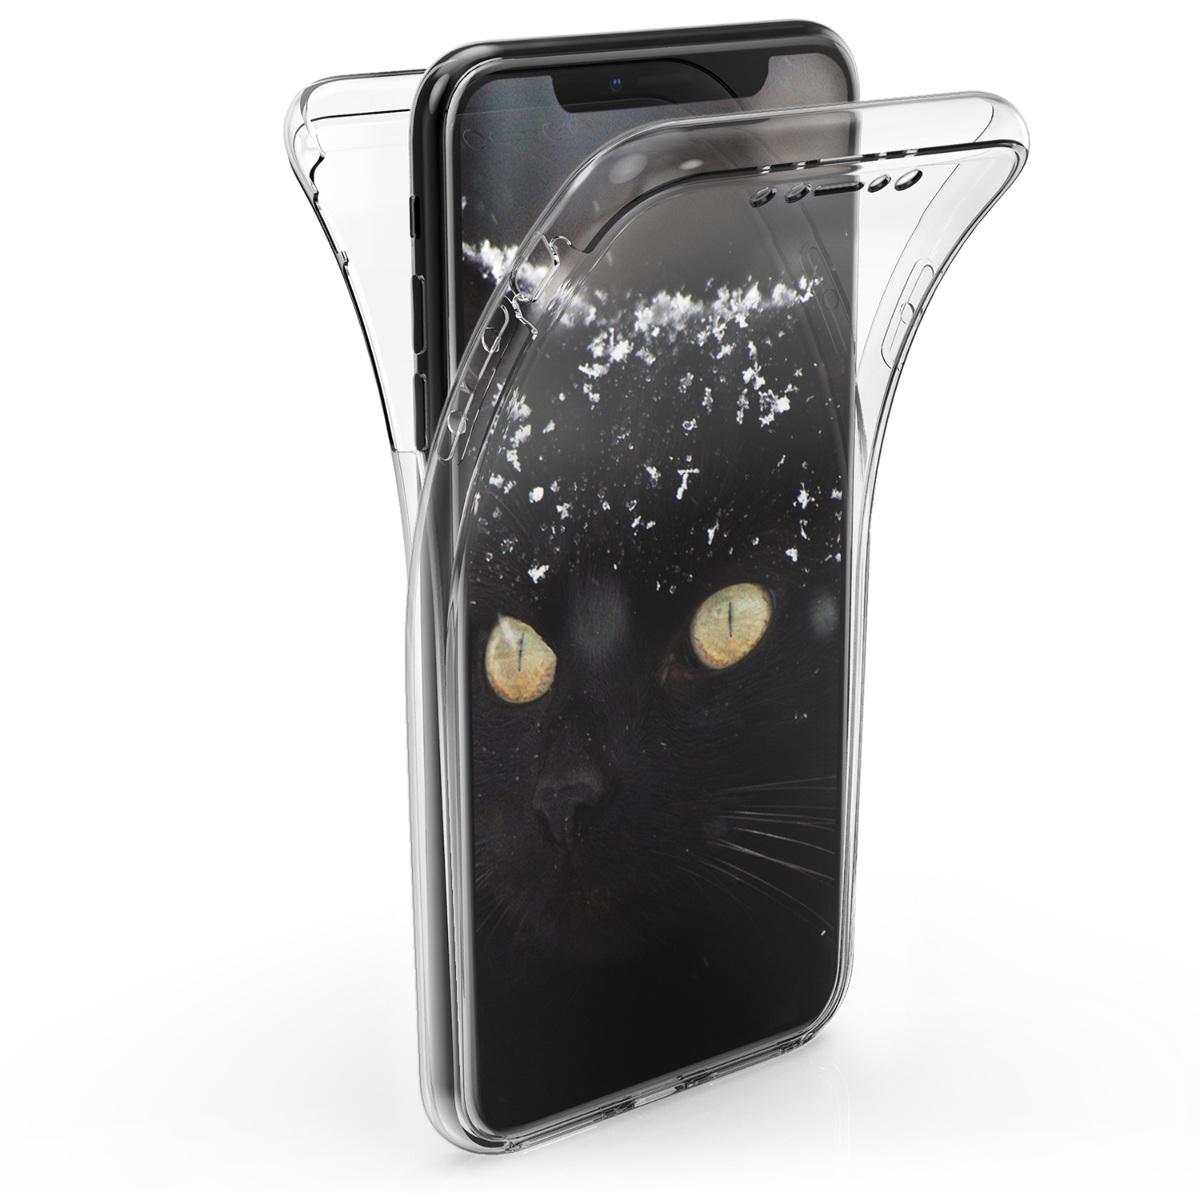 KW Διάφανη Θήκη Σιλικόνης Full Body iPhone XS Max (45953.03)